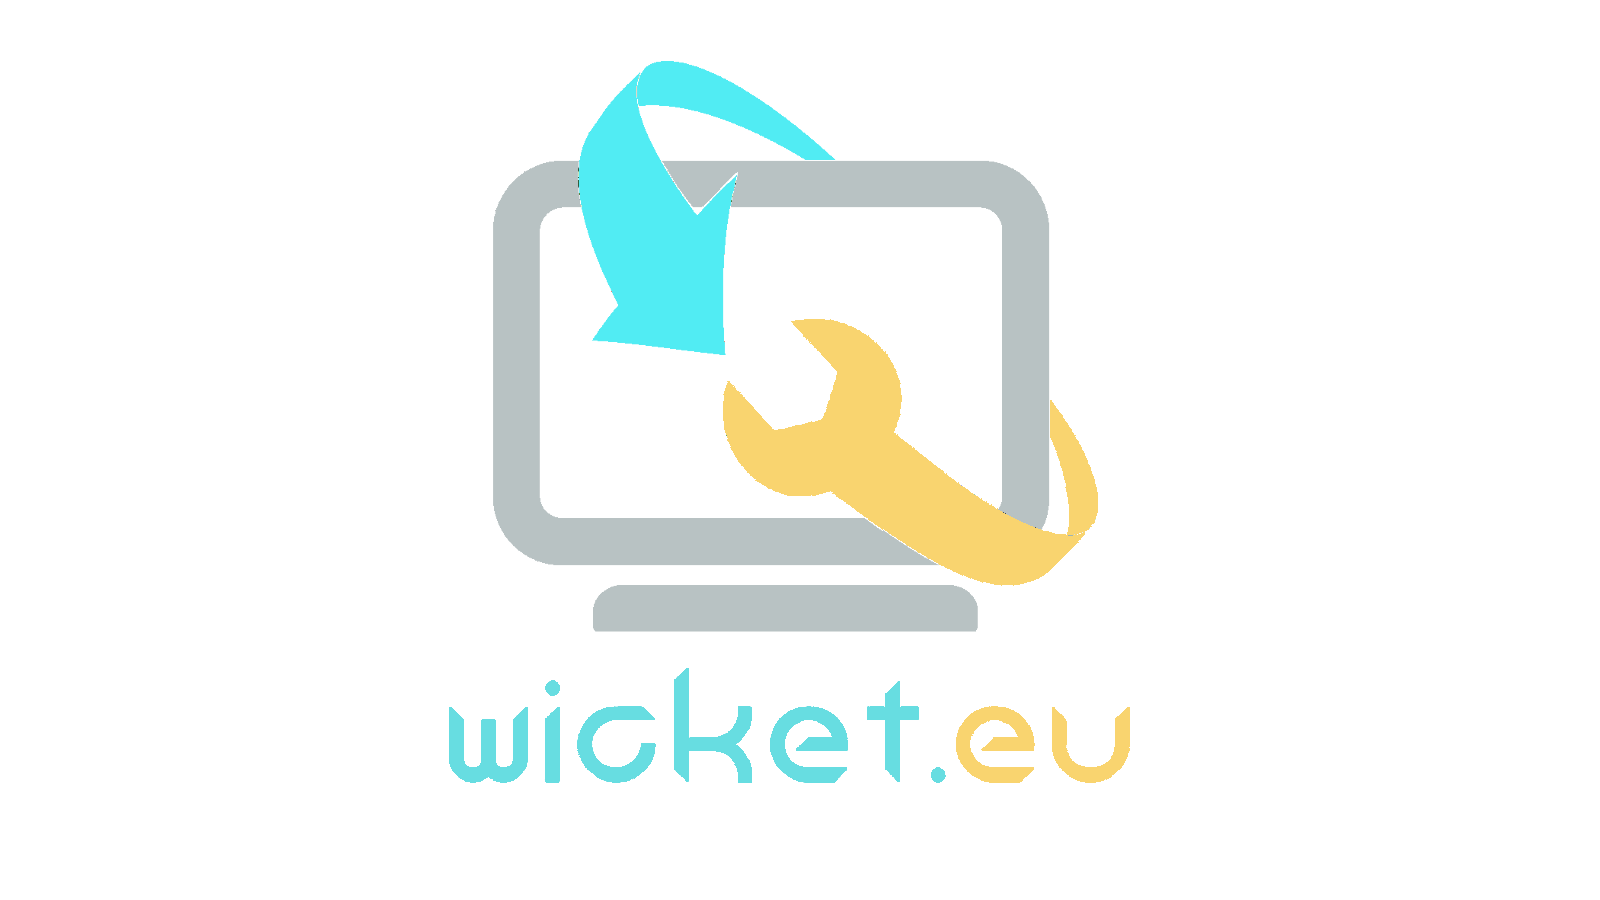 Logo wicket.eu